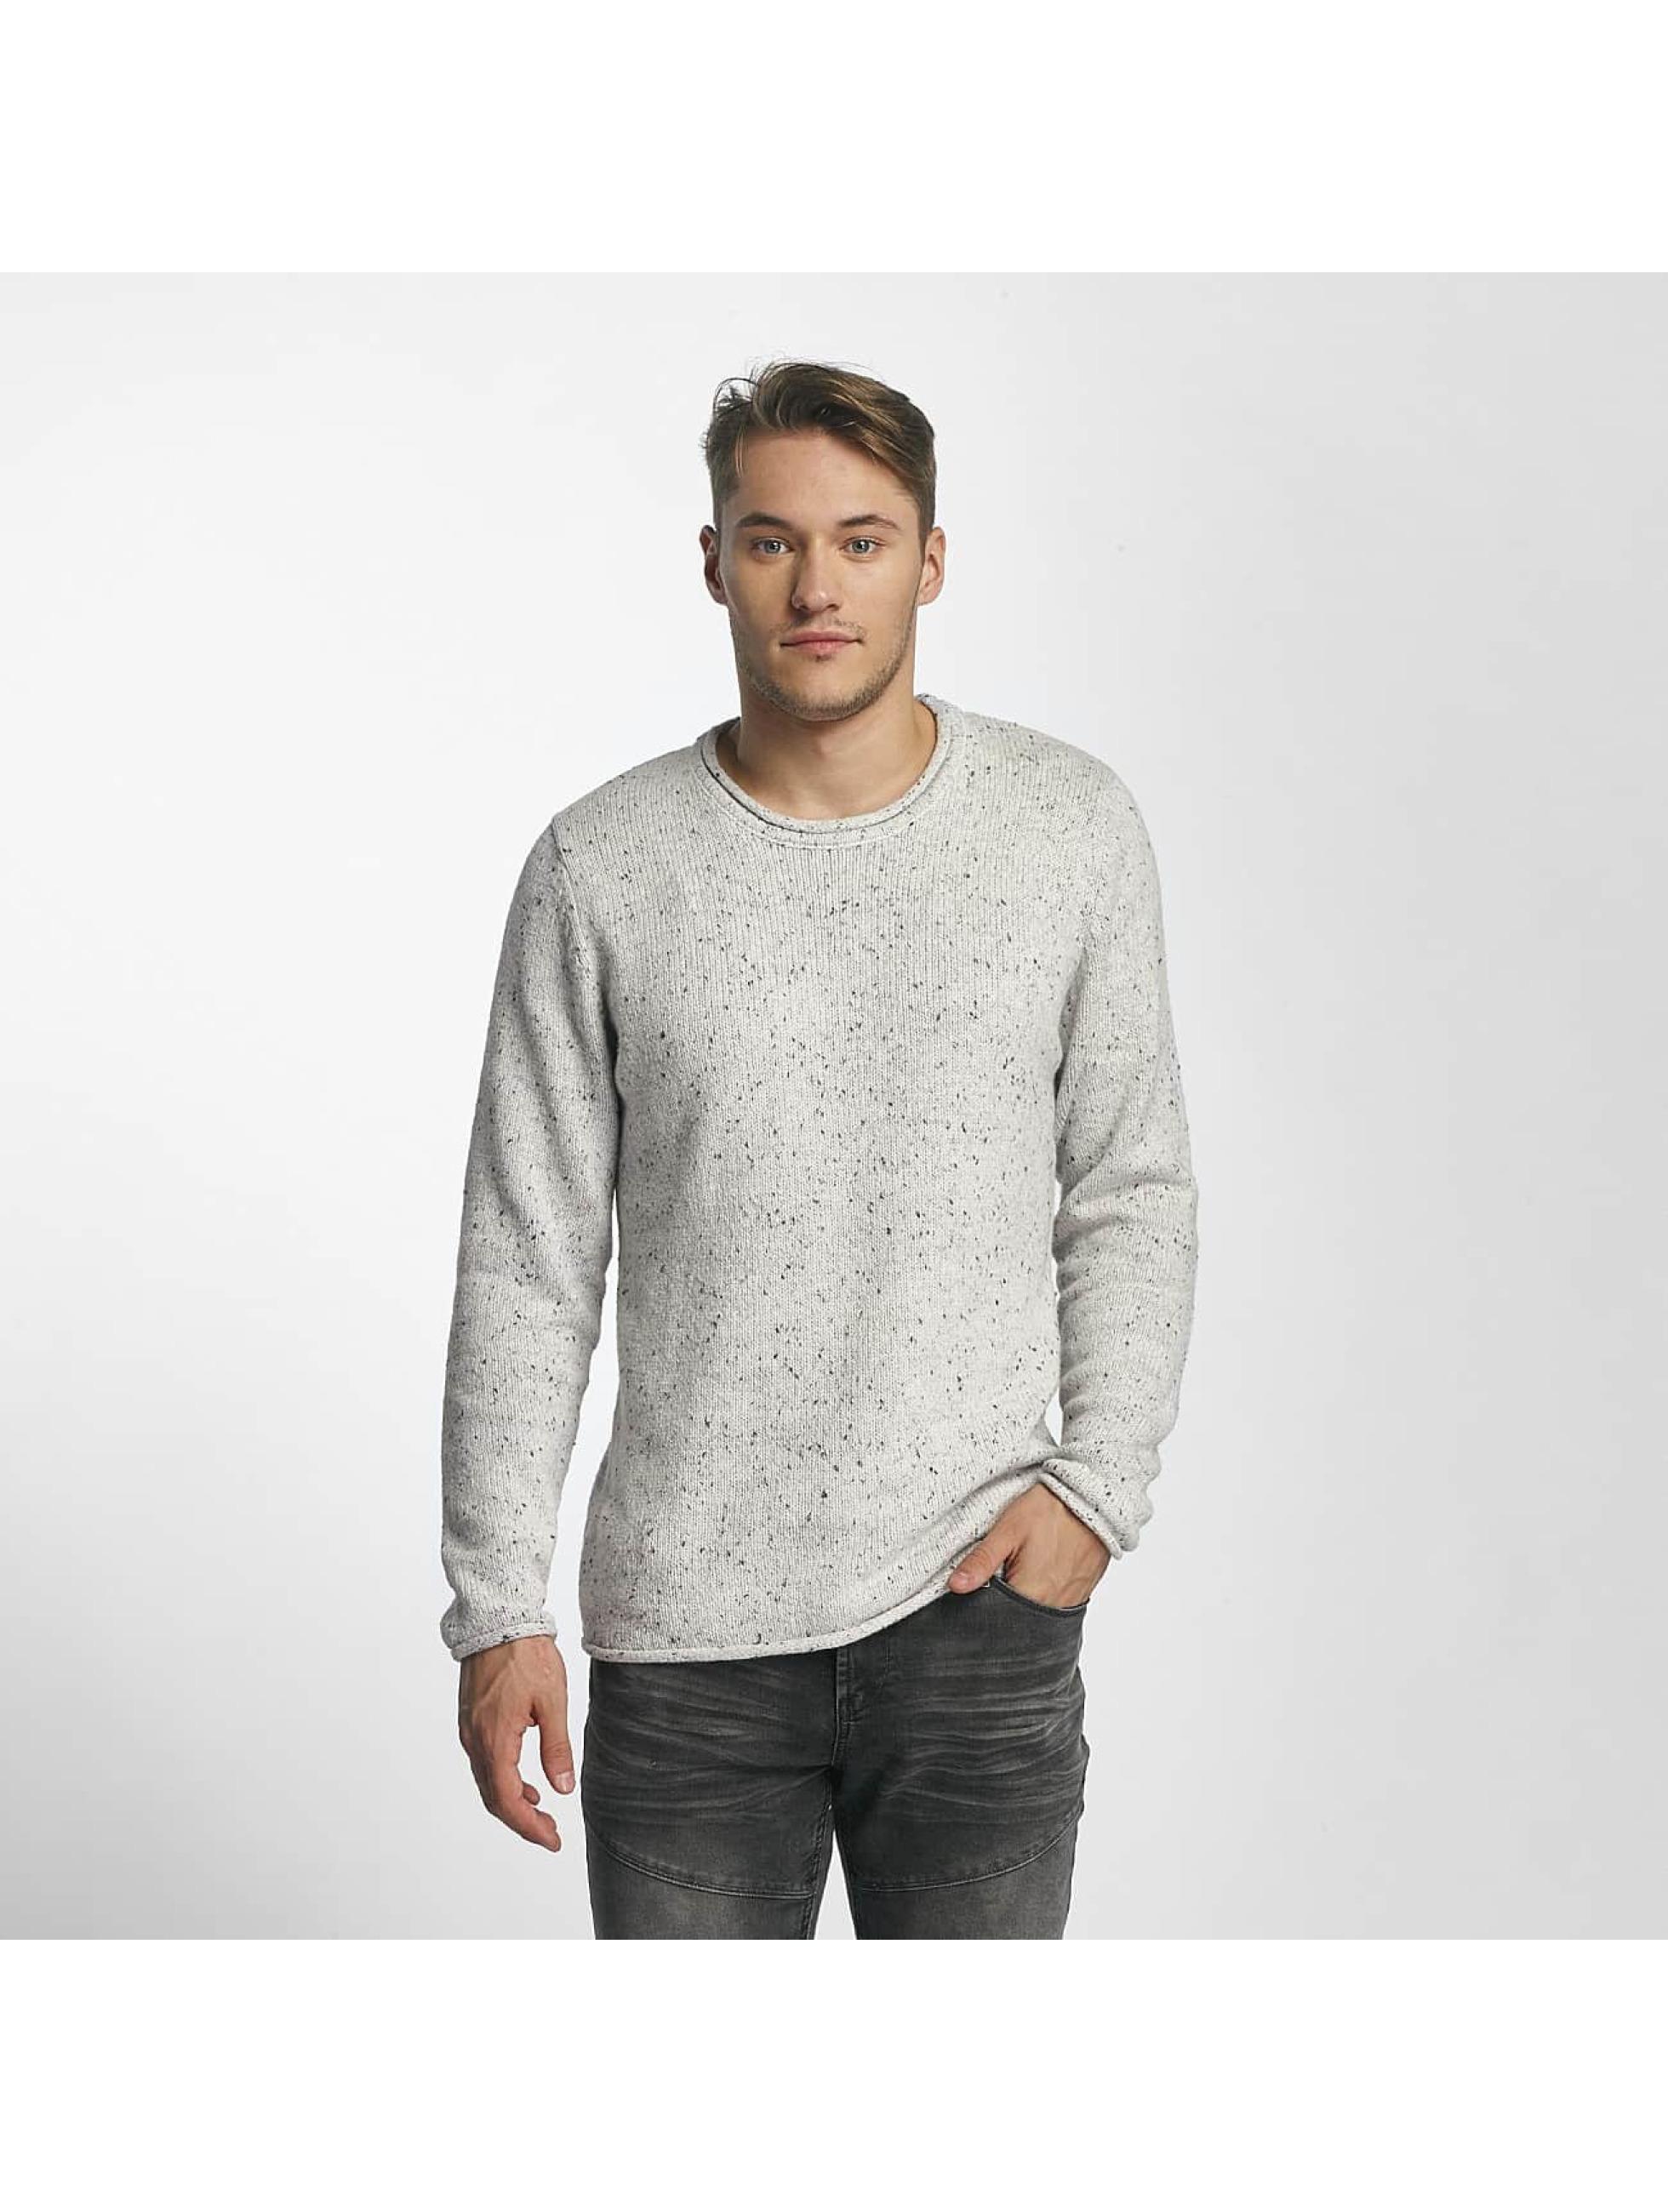 SHINE Original Männer Pullover Morton in weiß